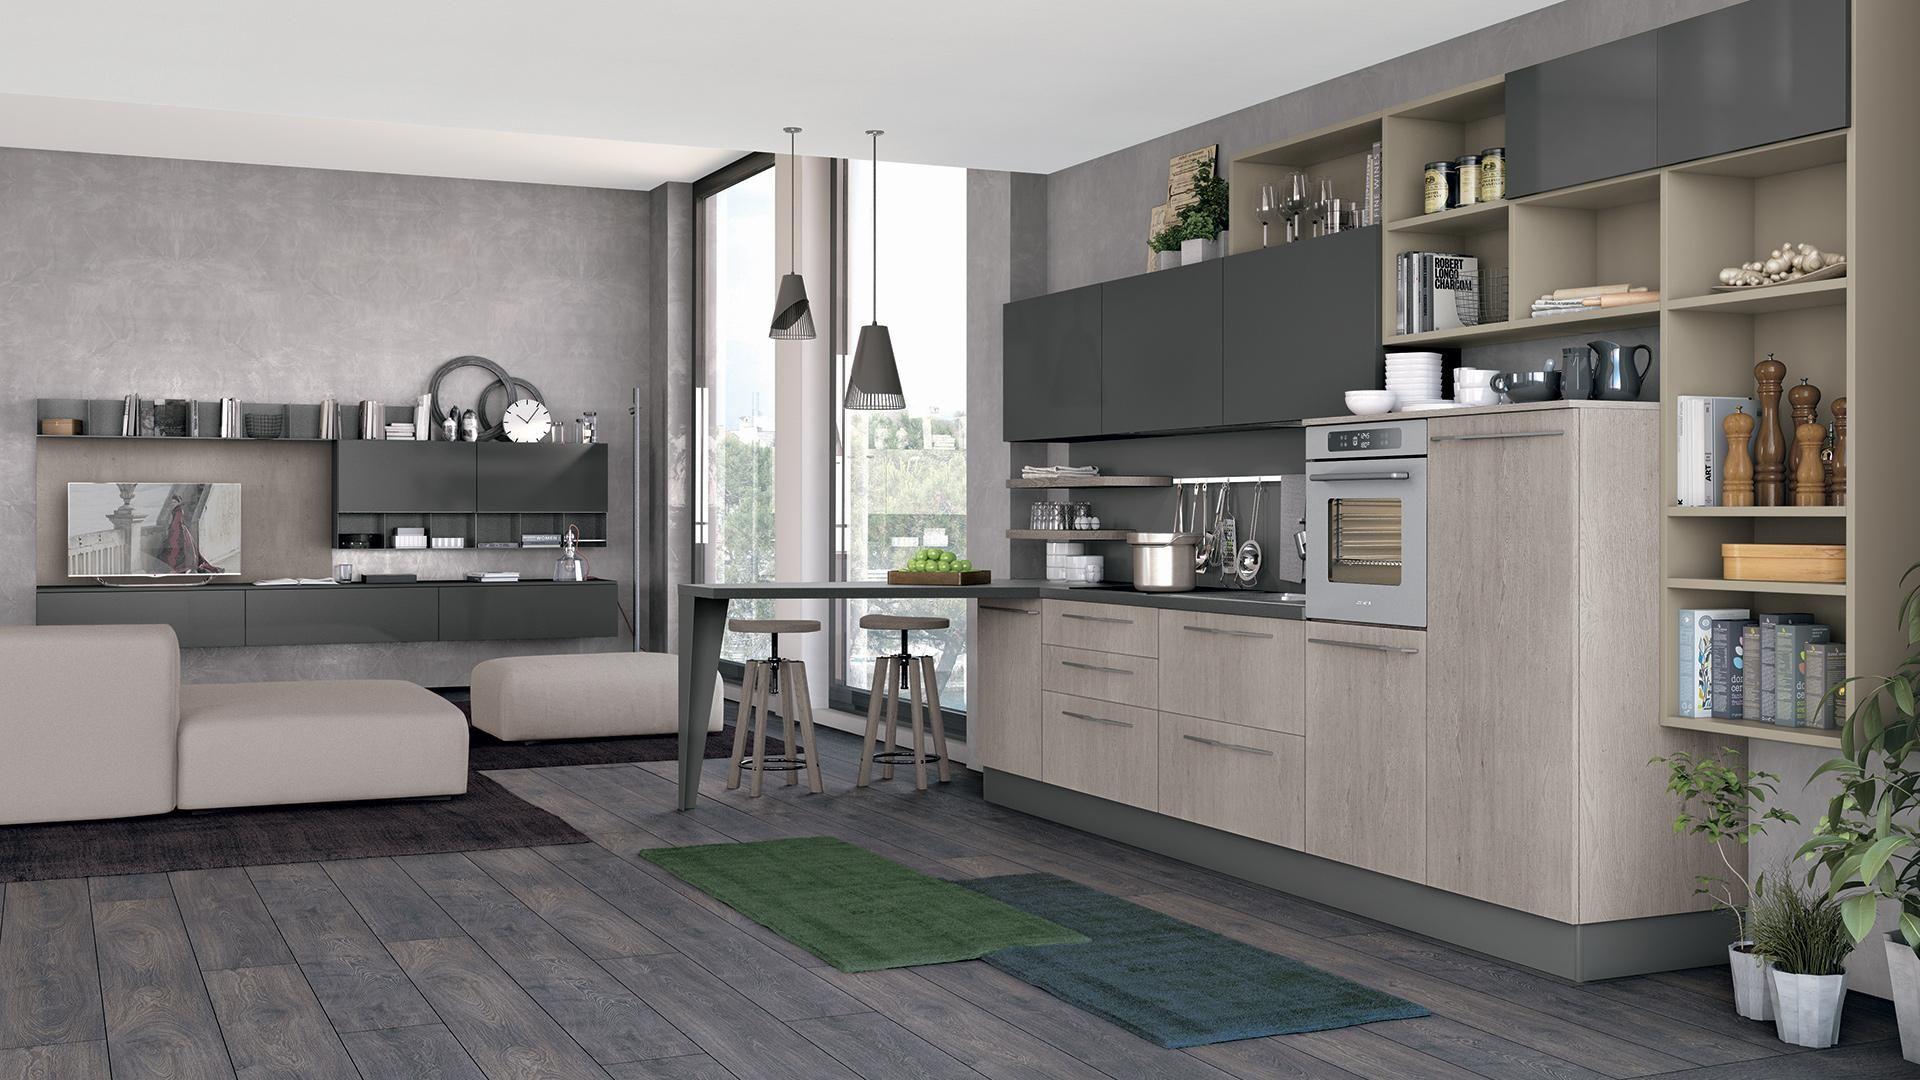 Clover Cucine Lube Cucine Moderne Arredo Interni Cucina Design Cucine